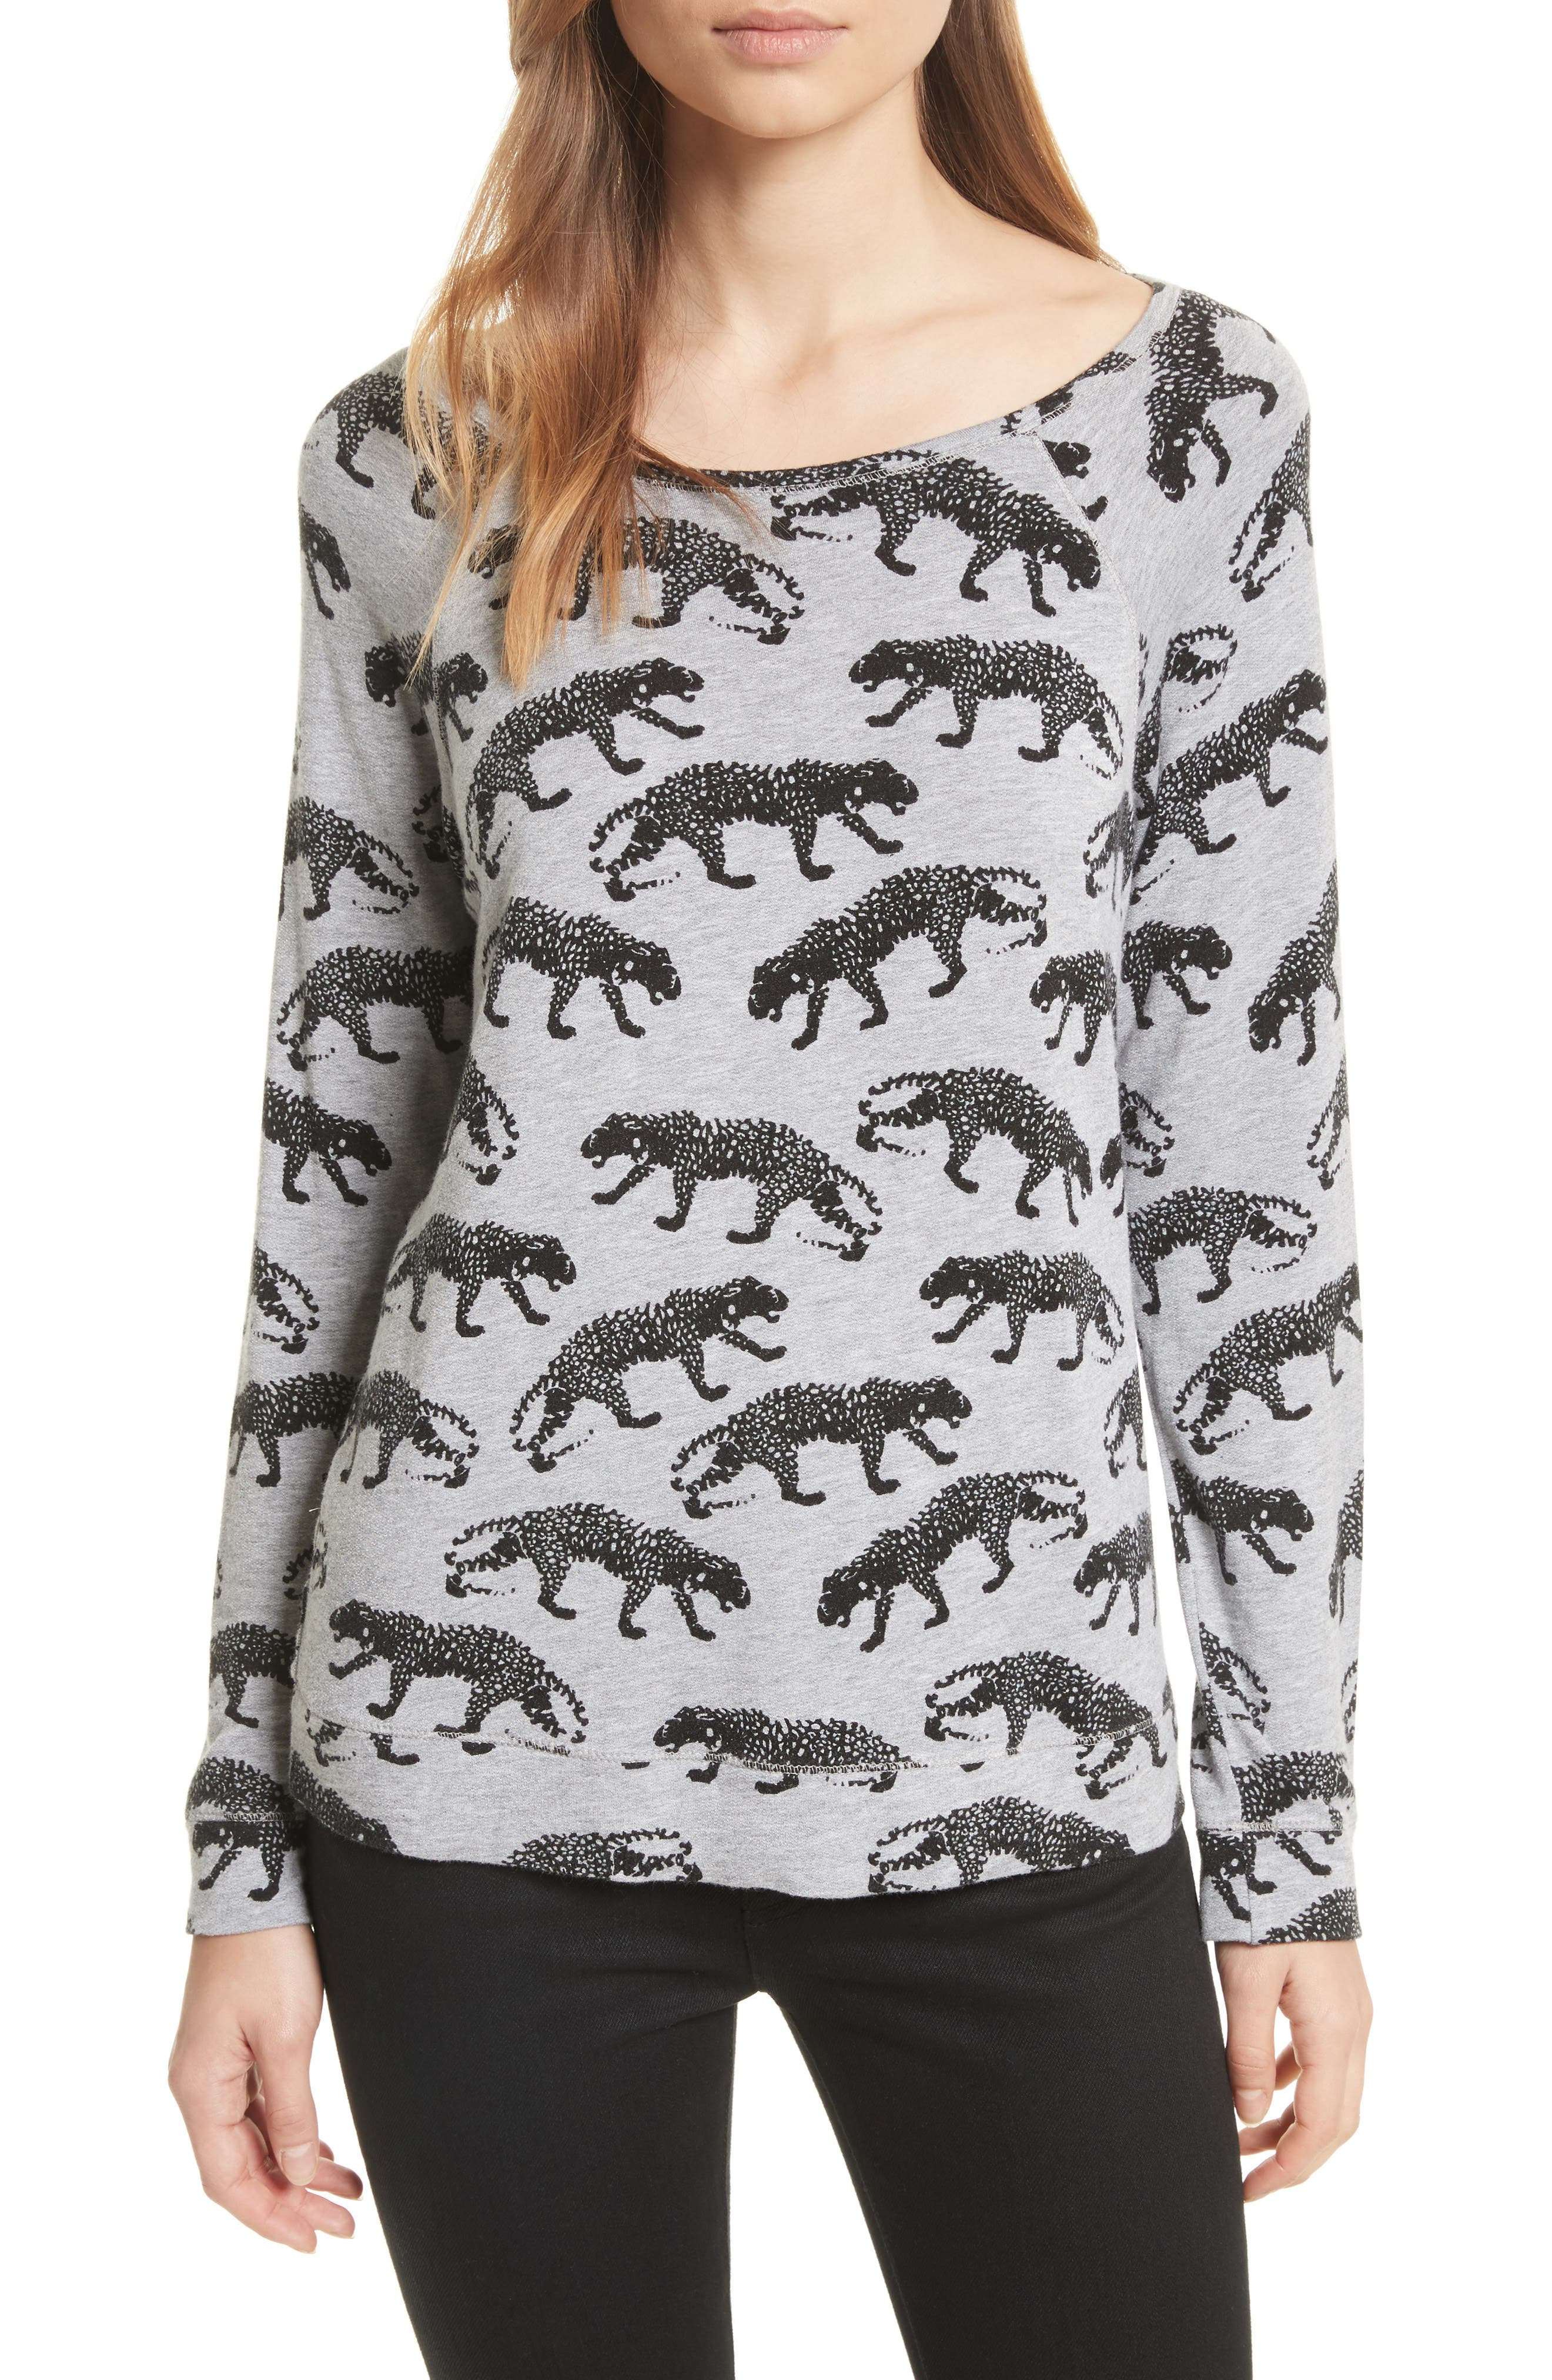 Annora B Animal Print Sweatshirt,                             Main thumbnail 1, color,                             033